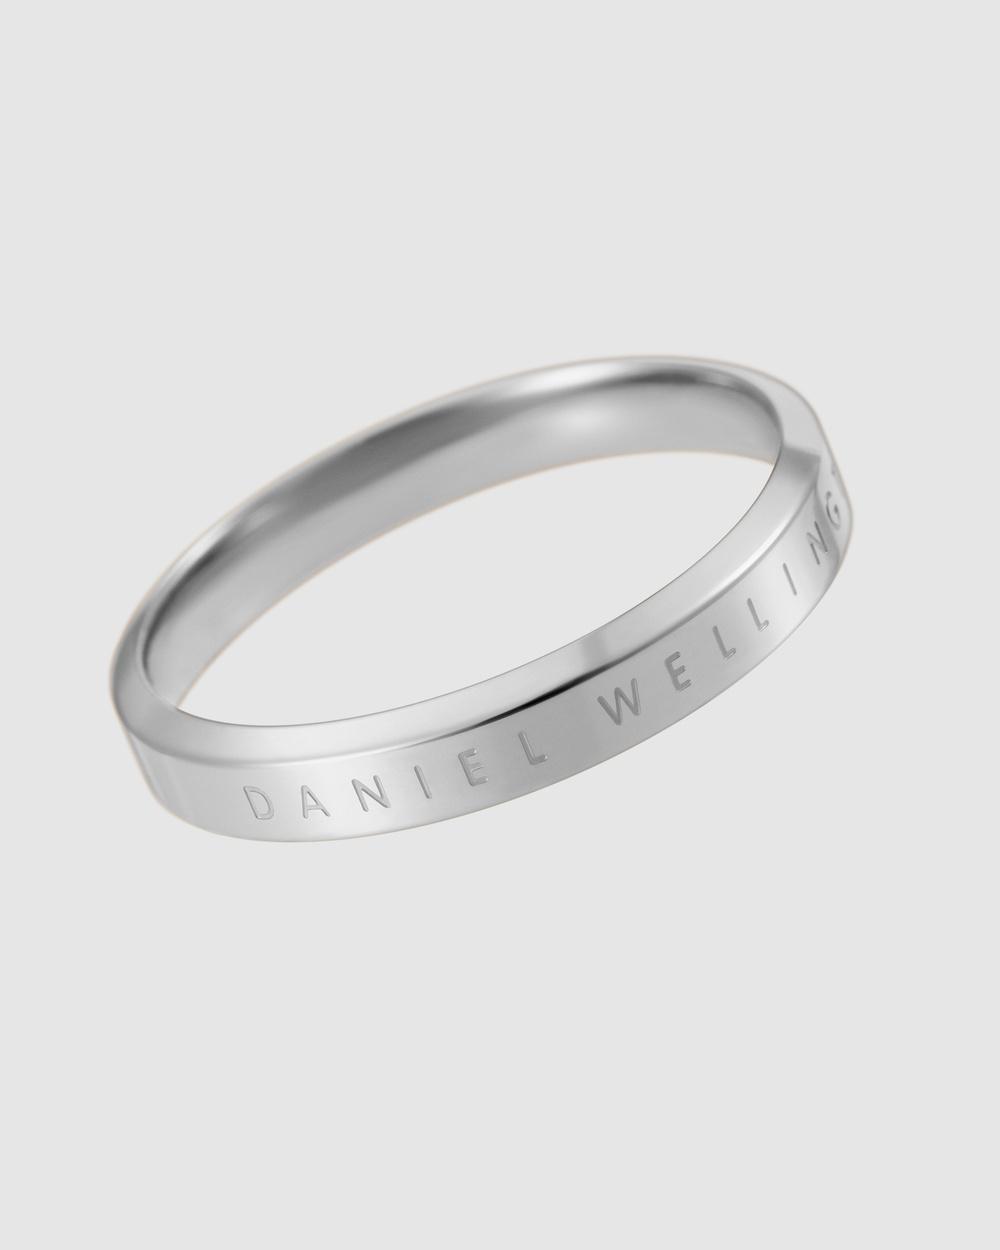 Daniel Wellington Classic Ring Jewellery Silver